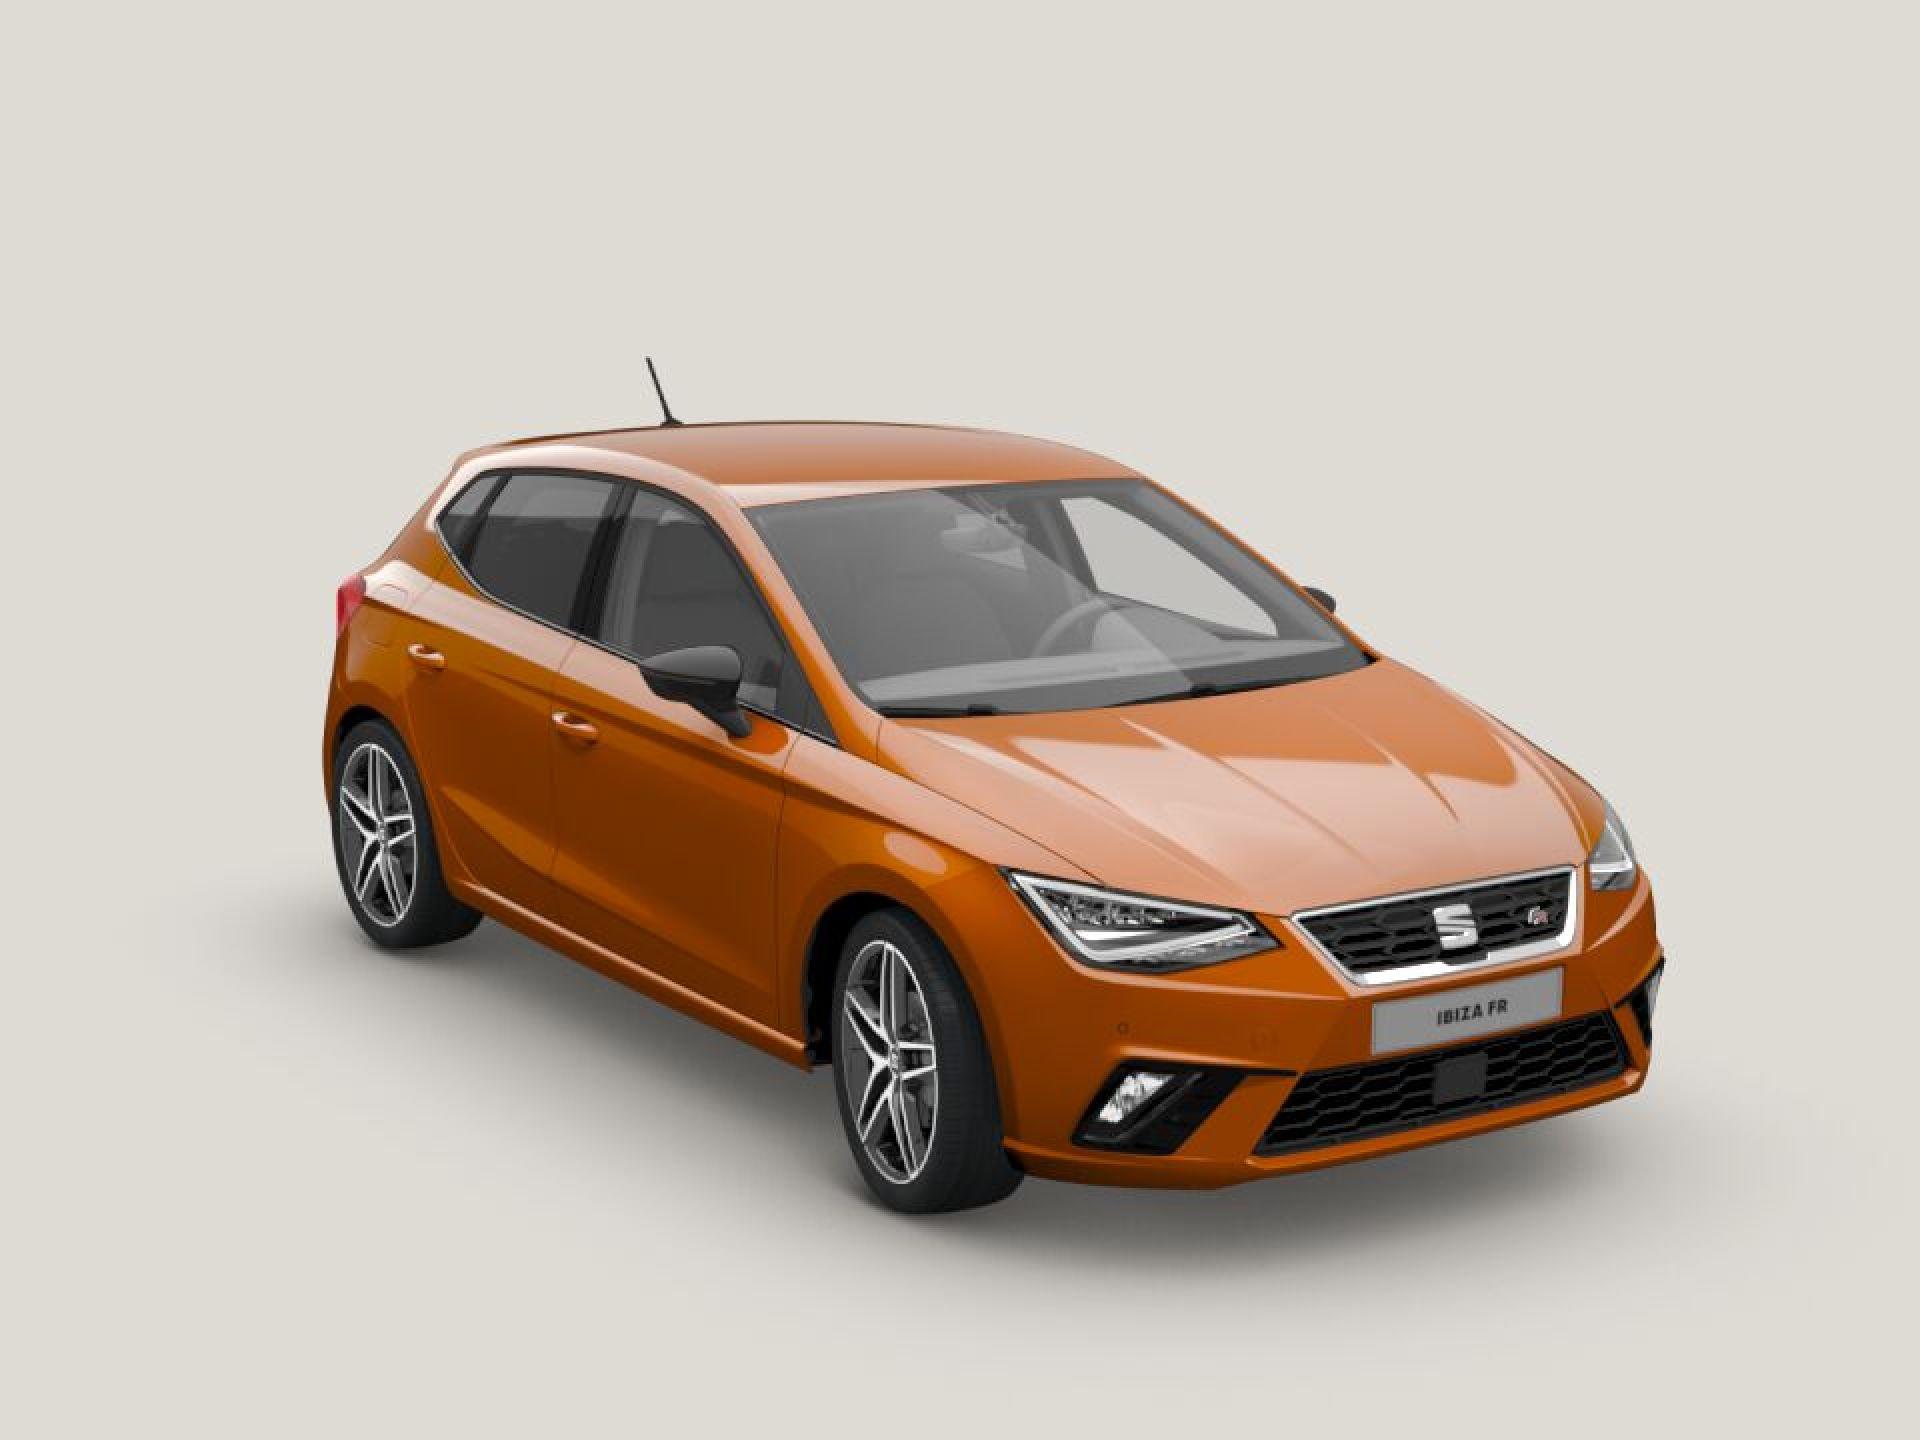 SEAT Ibiza 1.0 TGI 66kW (90CV) FR Eco Plus nuevo Madrid